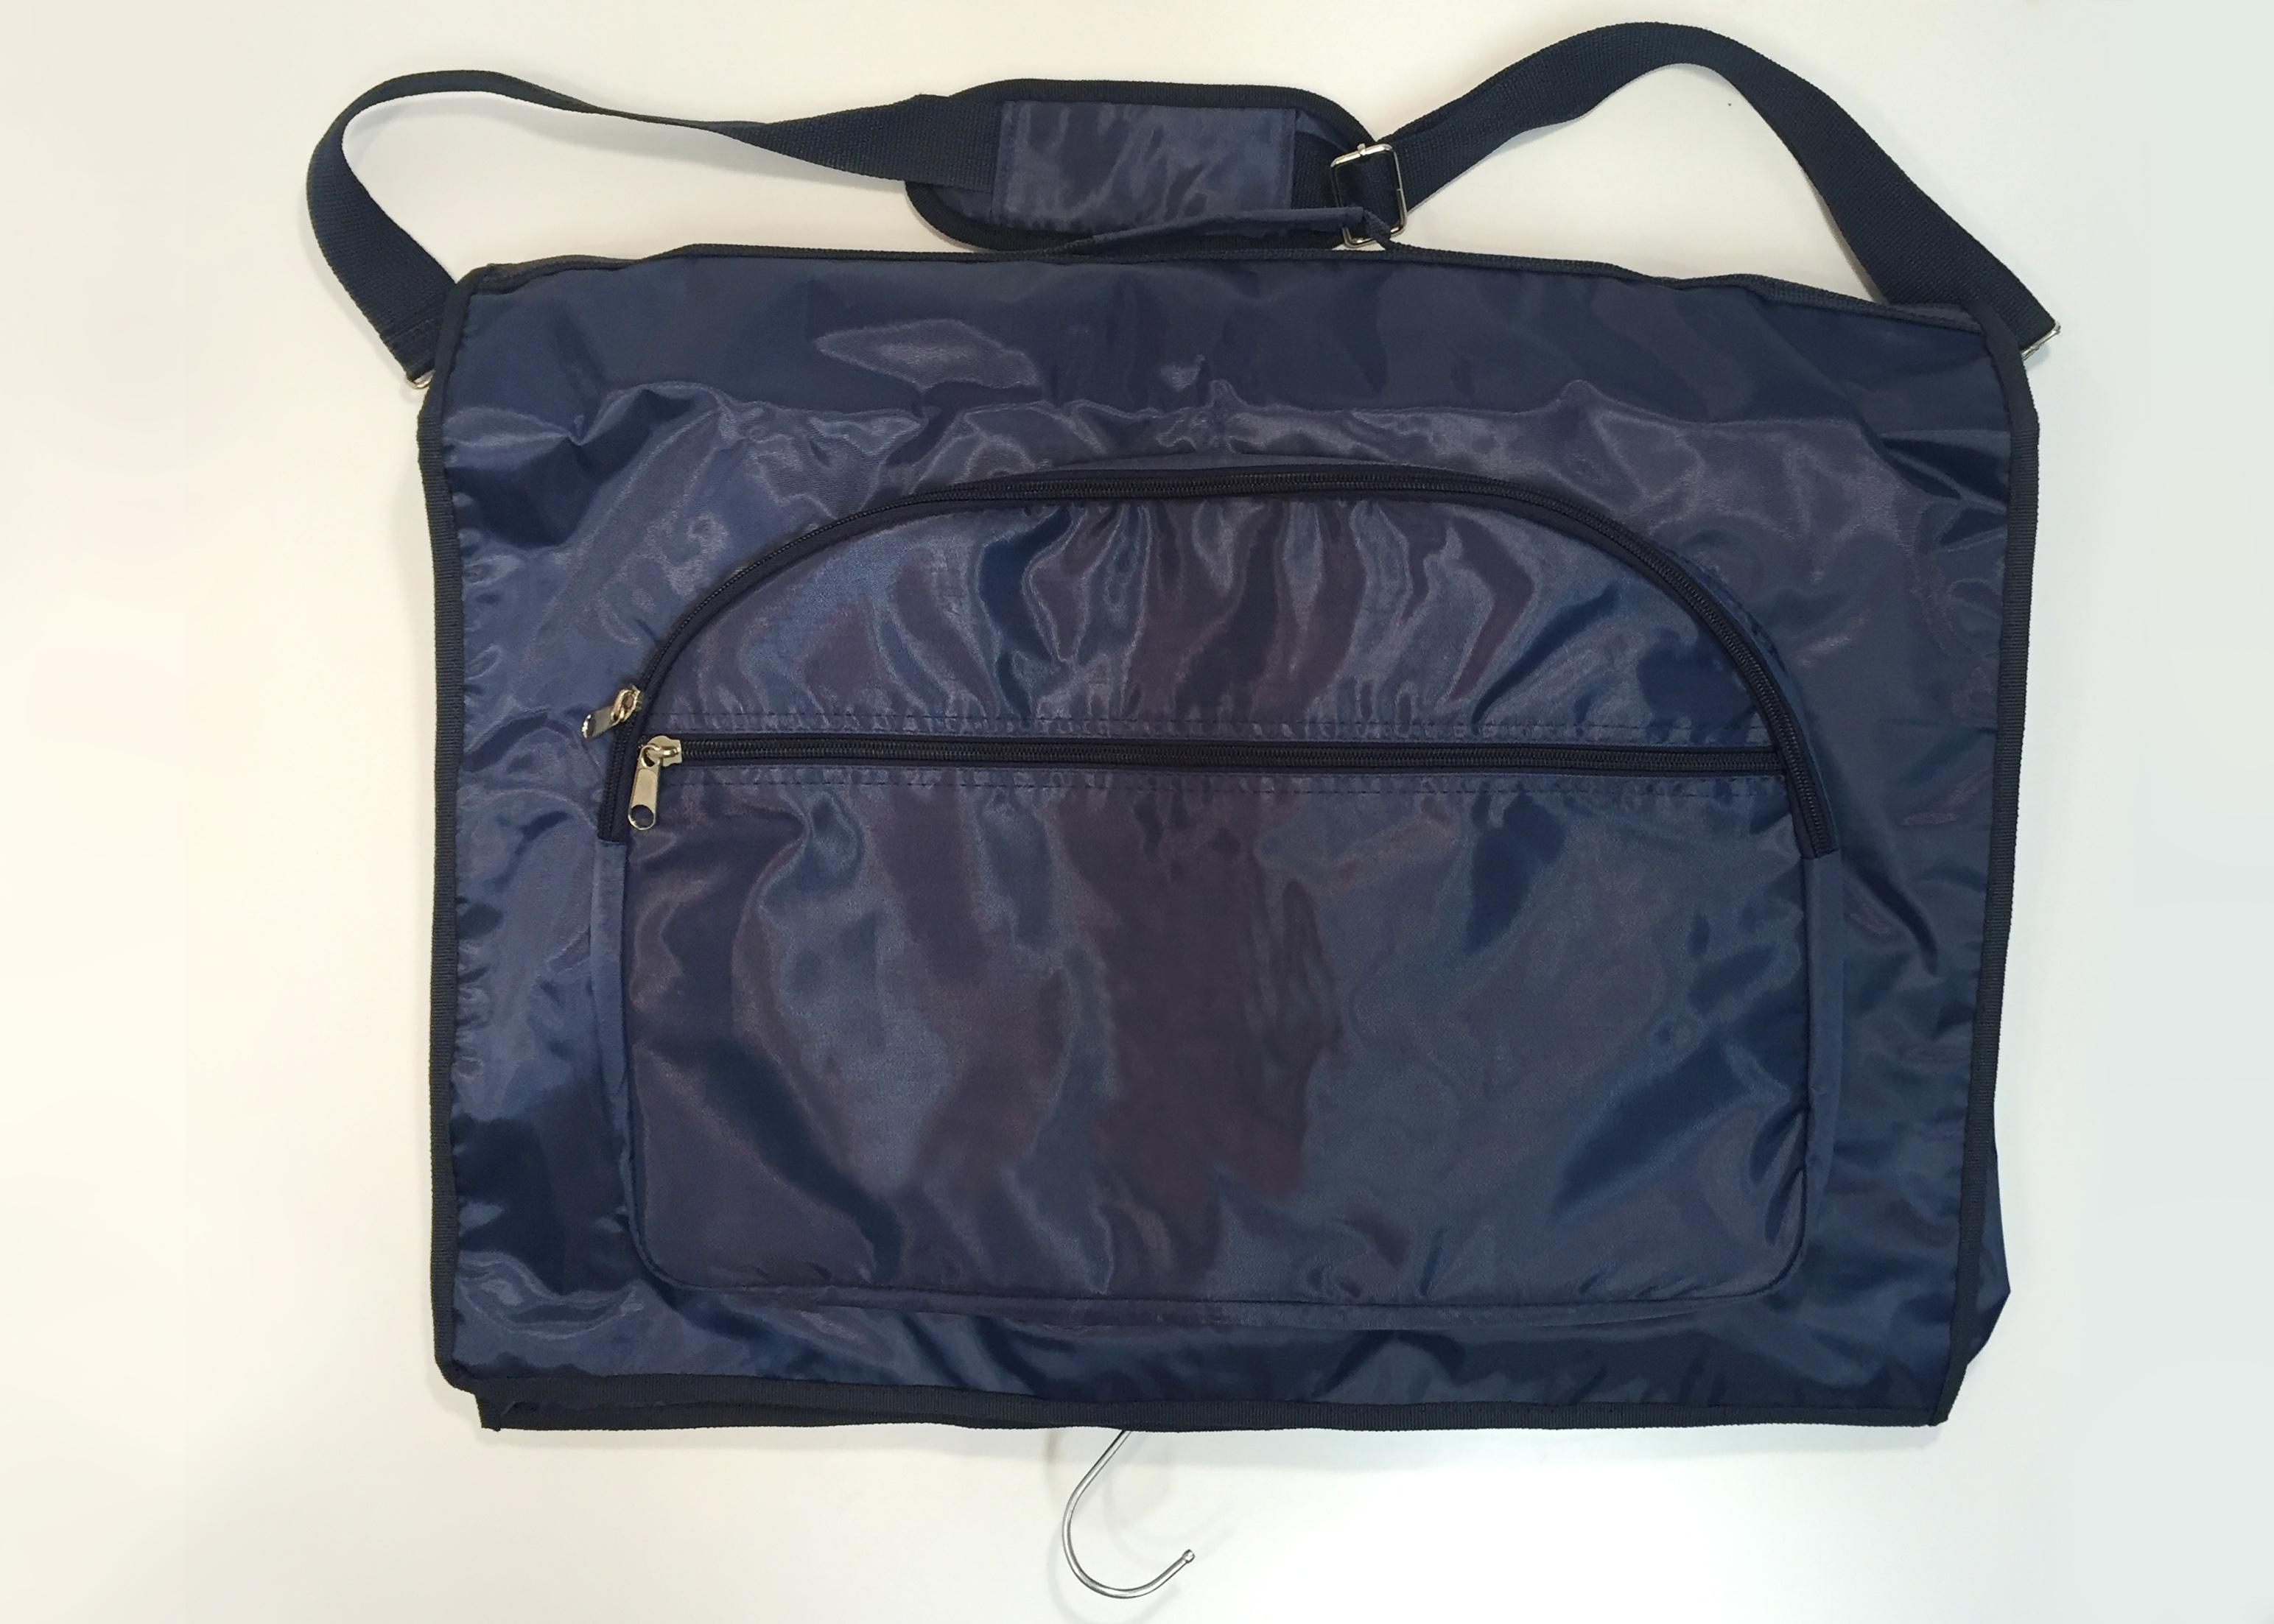 TRAVEL BAG FOR CLOTHES - BLU NYLON -